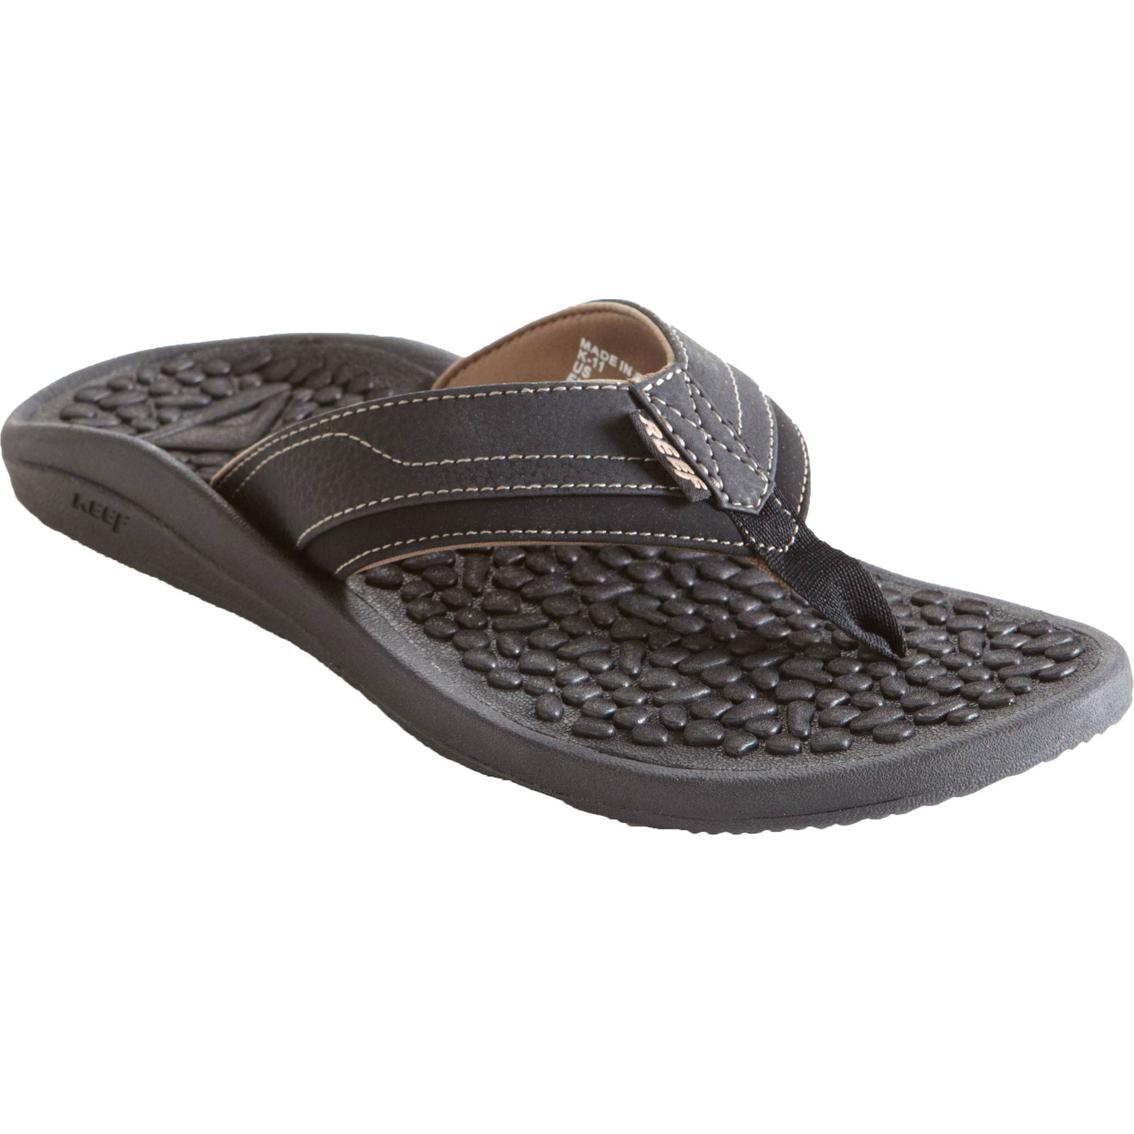 9f193eace846 Reef Men s Playa Negra Black Sandals